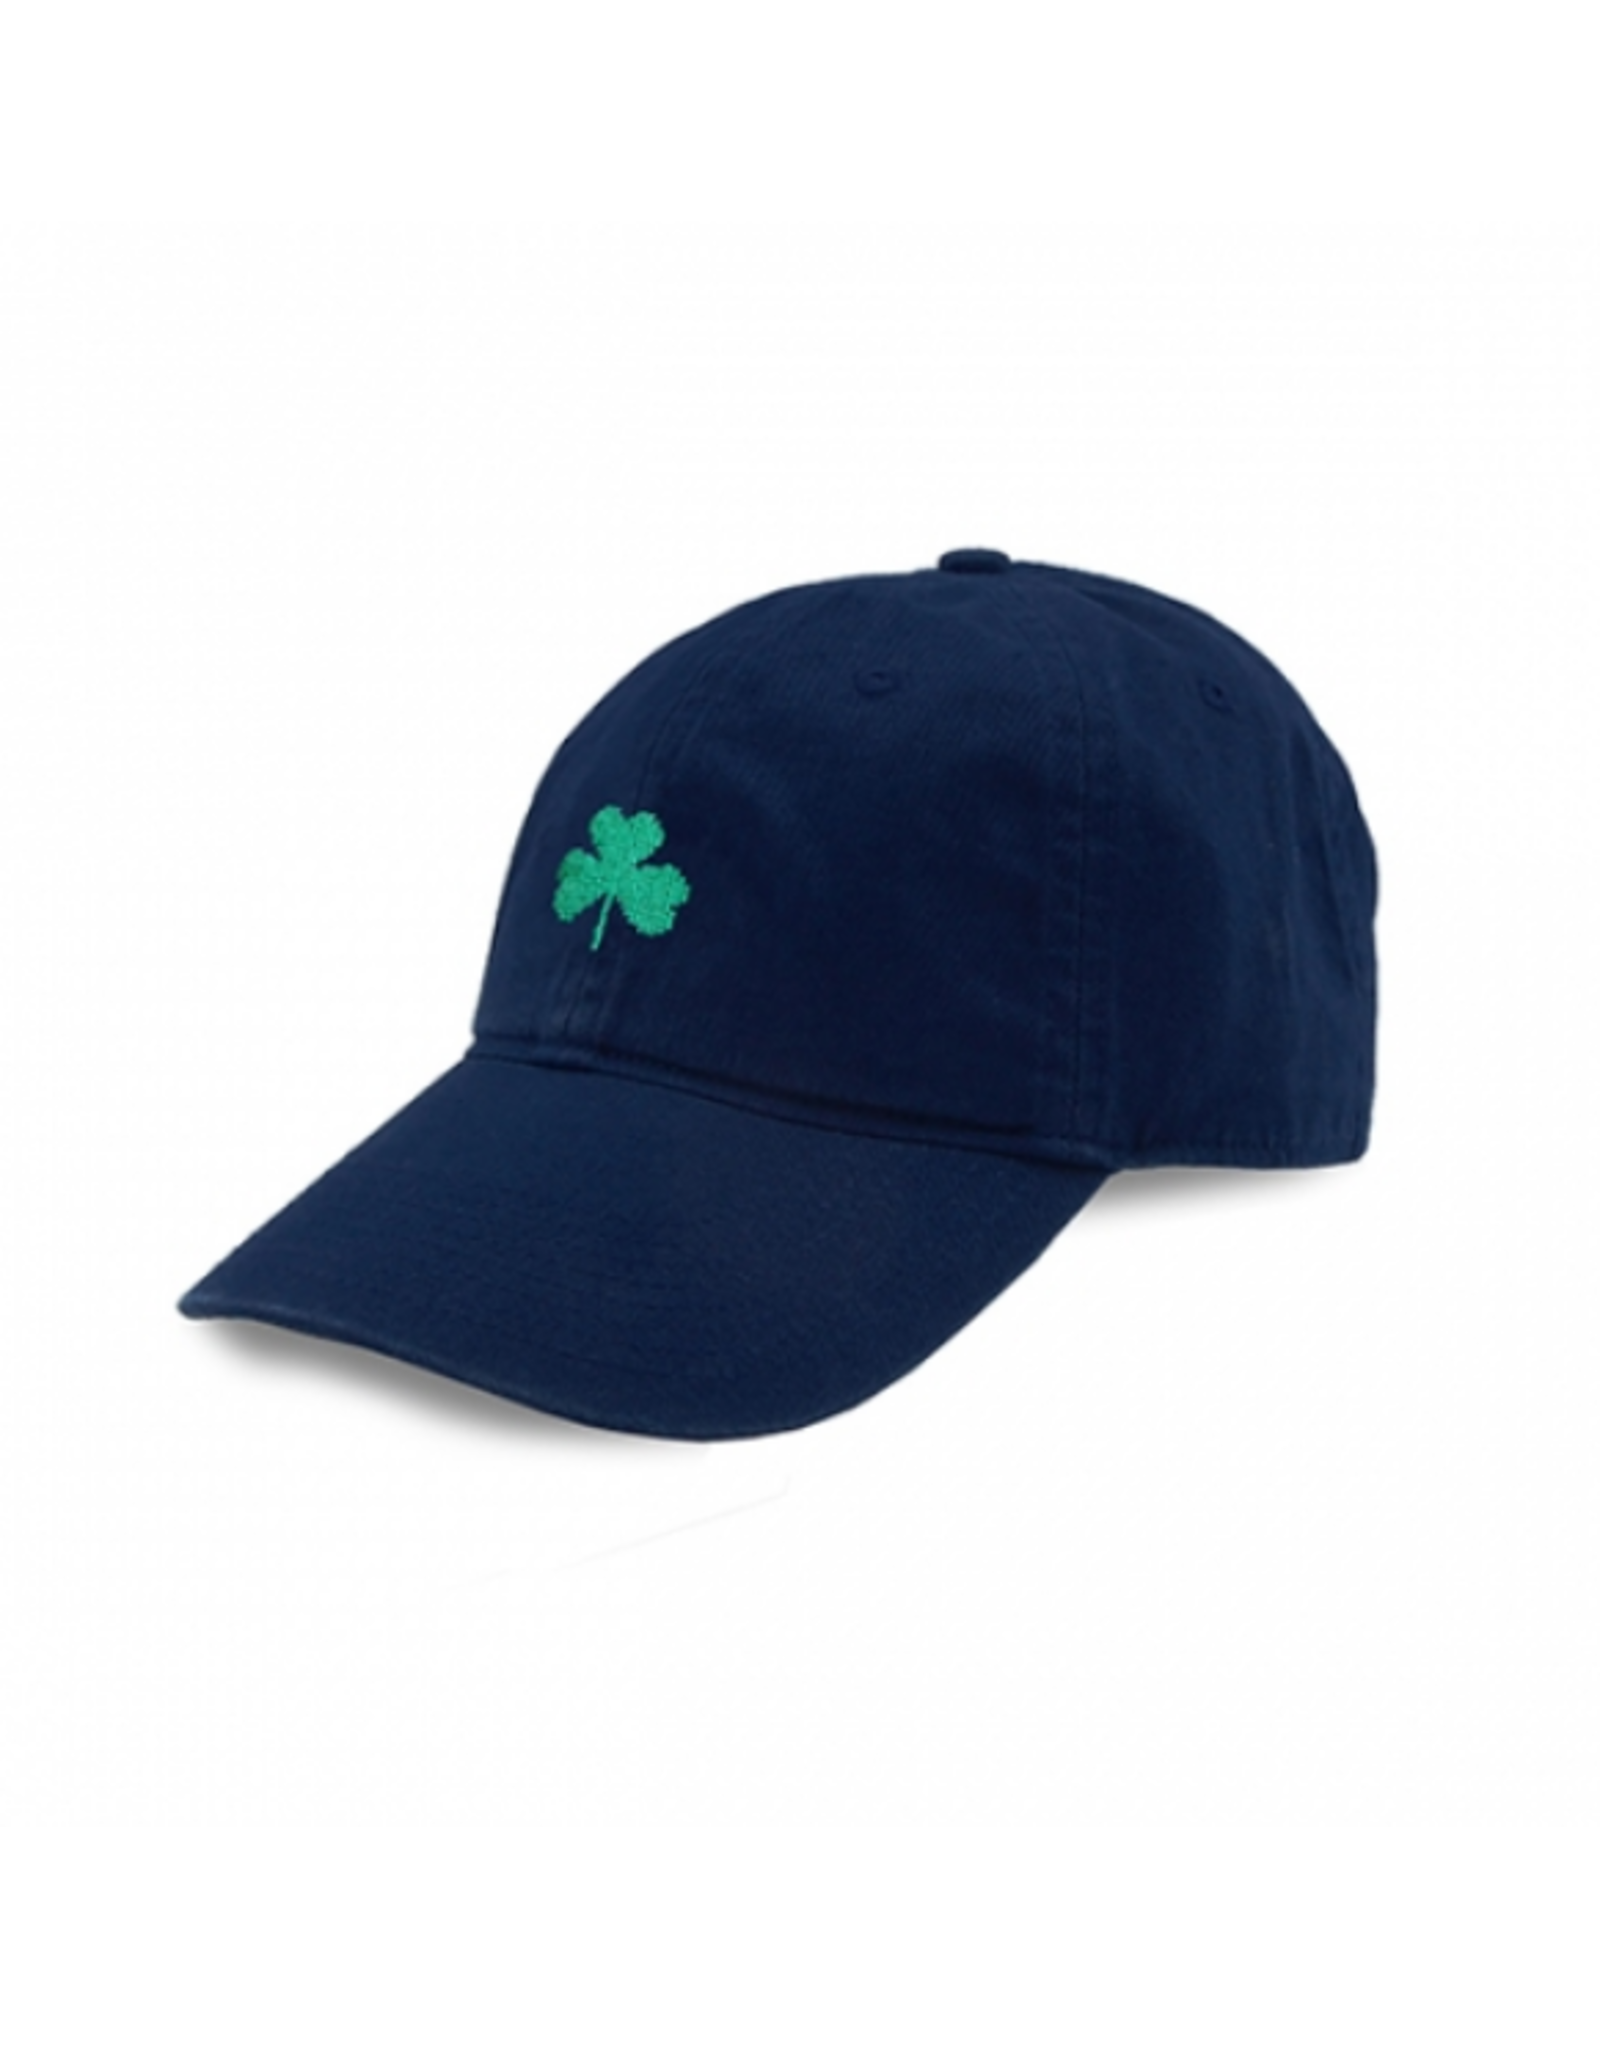 Smathers & Branson S&B Needlepoint Ball Hat, Shamrock Hat on Navy